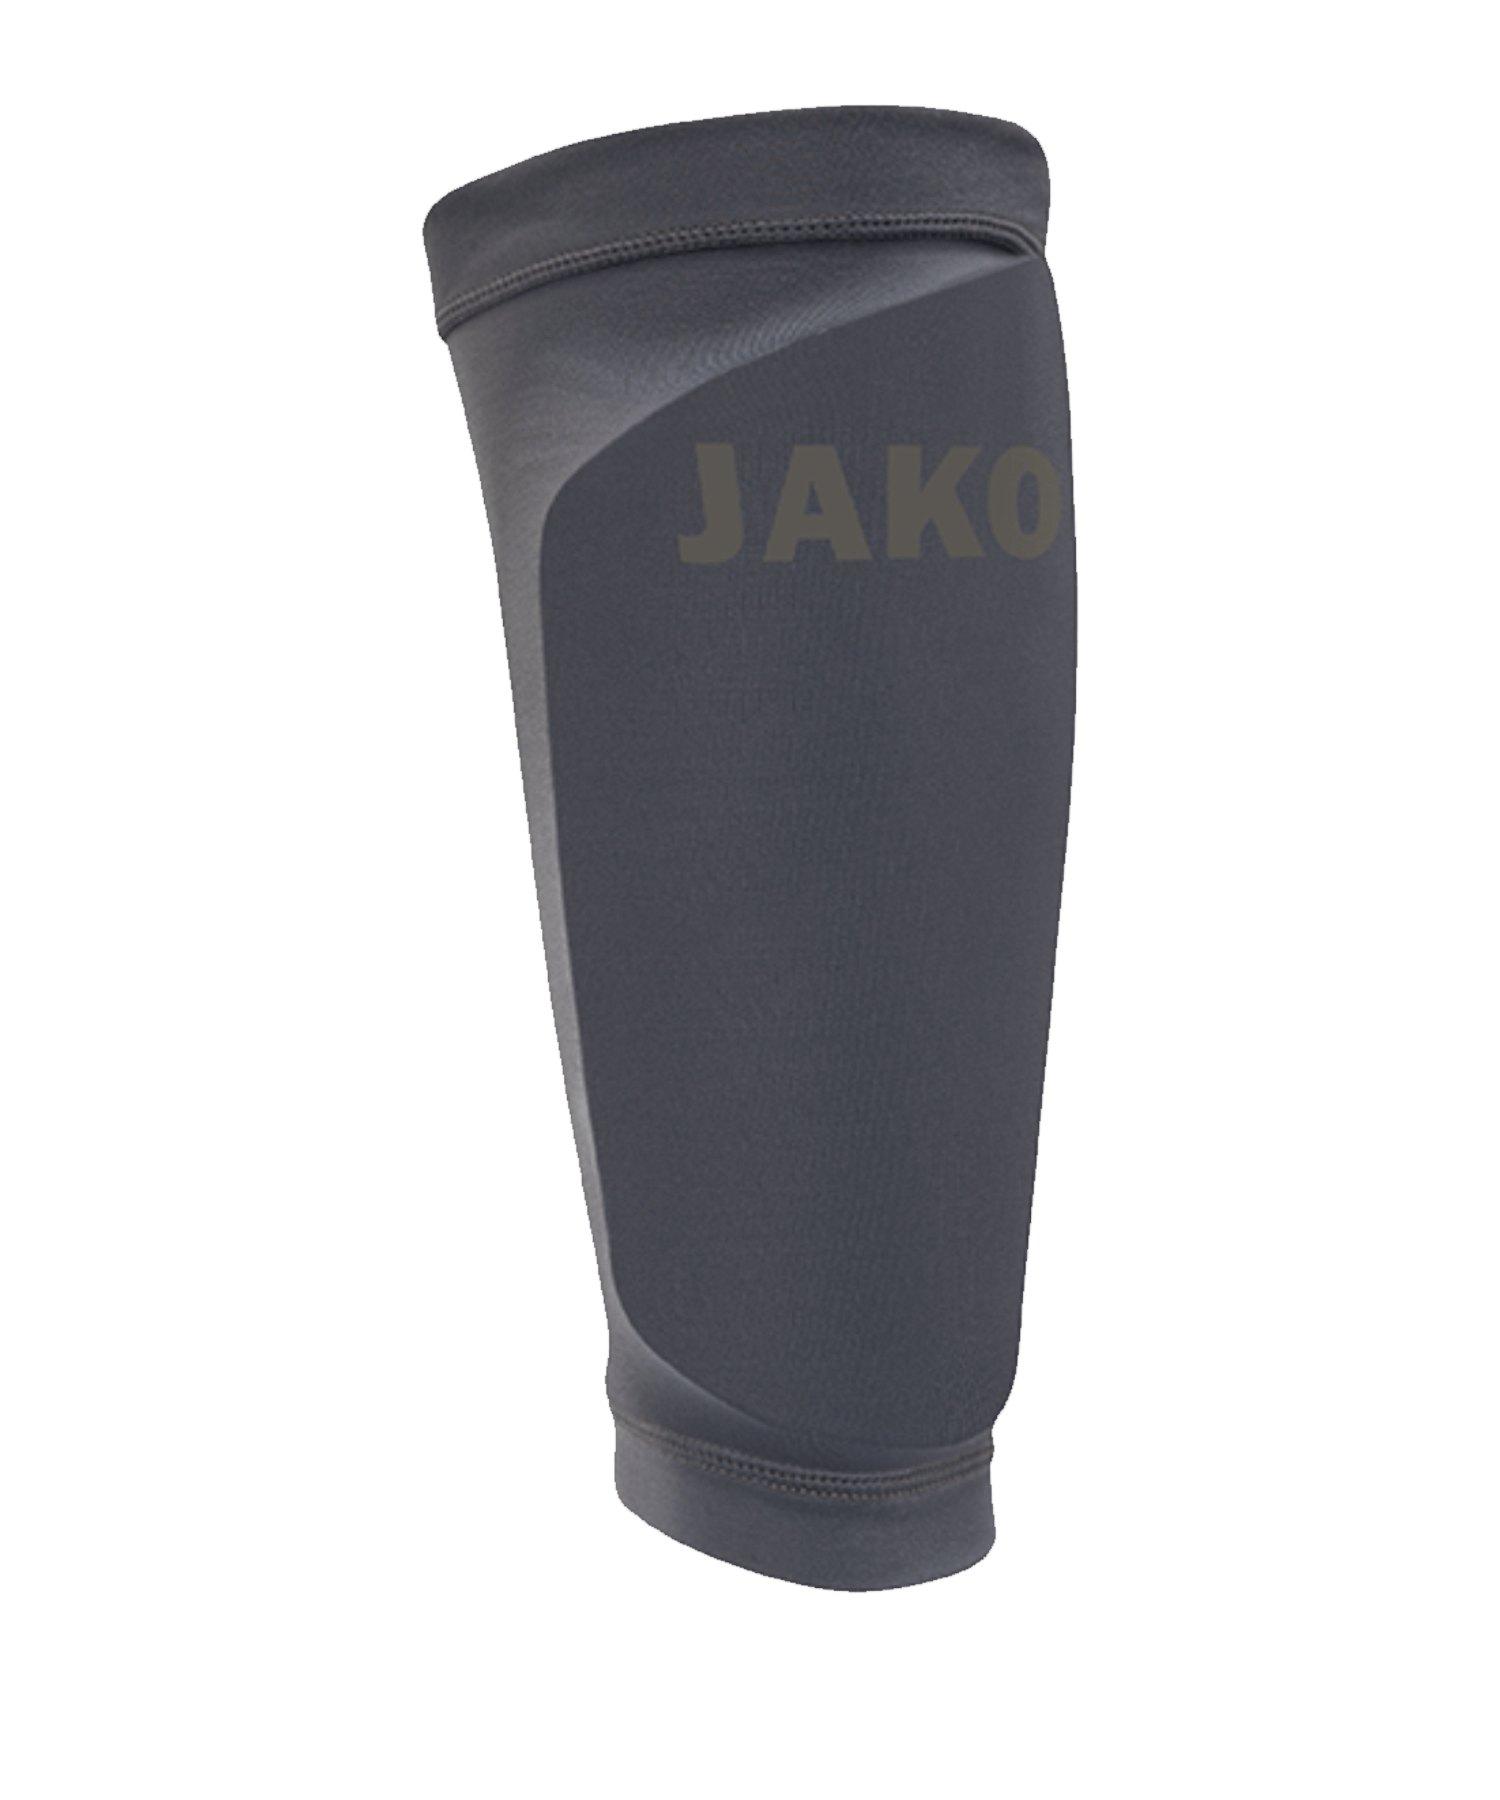 JAKO Light Strumpf für Schienbeinschoner Grau F21 - grau